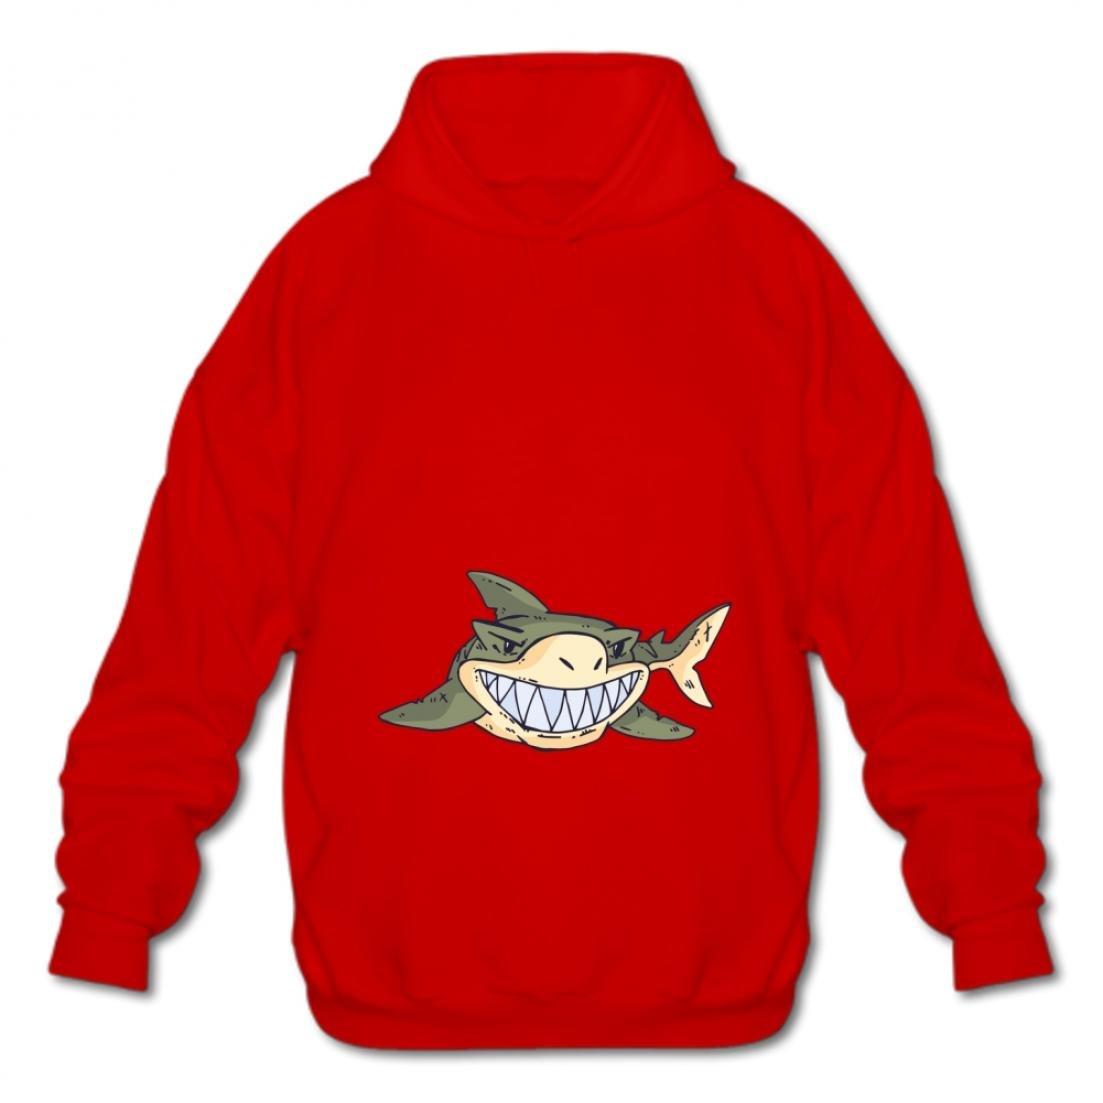 Gizhongqu Fashion Hoodies-03 Cartoon Shark Syoc Mens Cotton Pullover Style Sweatshirts Hoodies